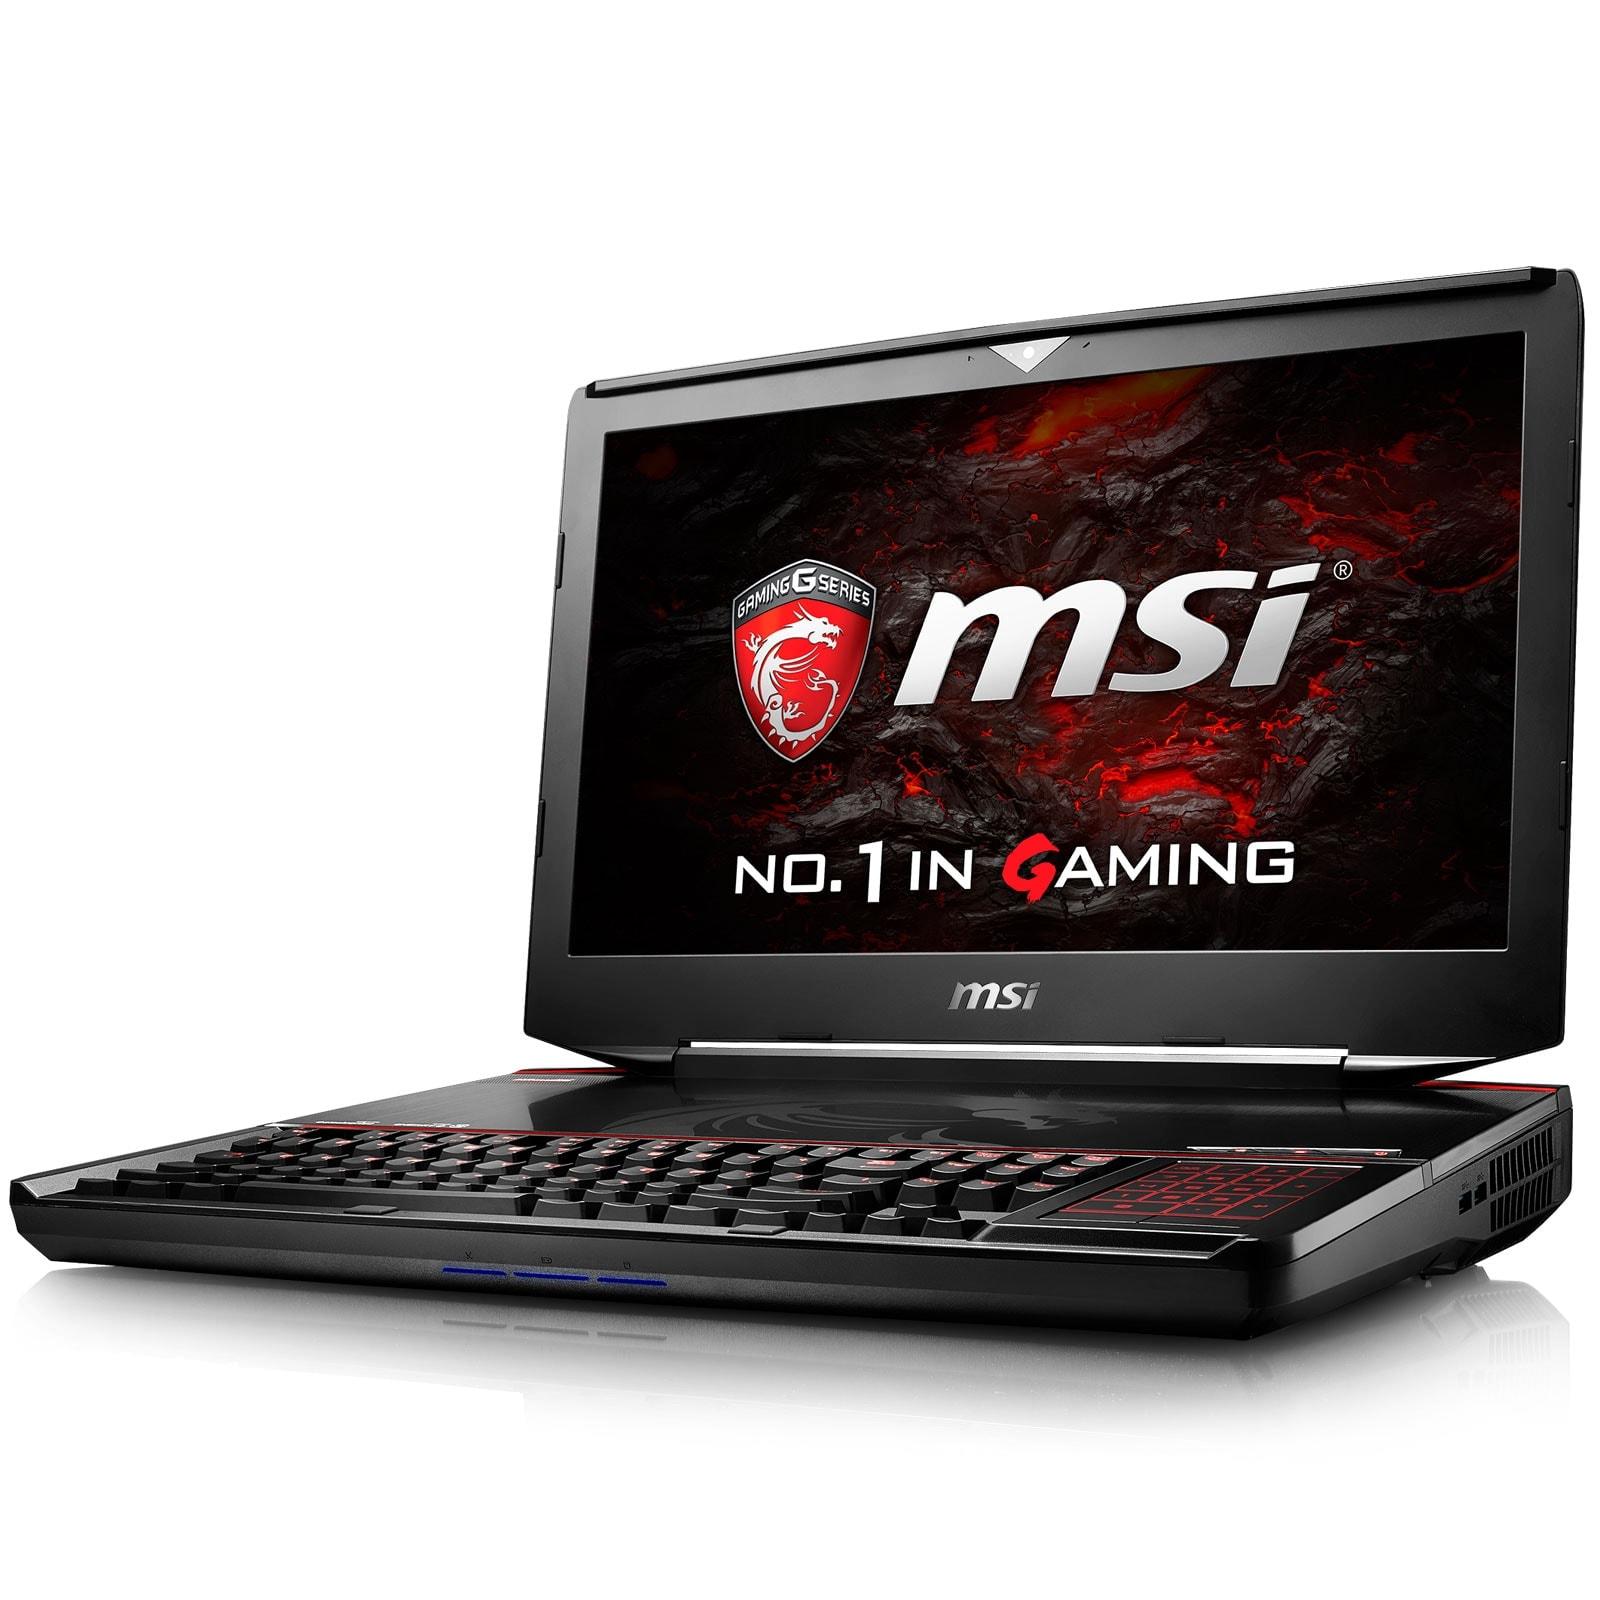 MSI GT83VR 6RF (Titan SLI)-037FR  (9S7-181512-037) - Achat / Vente PC portable sur Cybertek.fr - 1